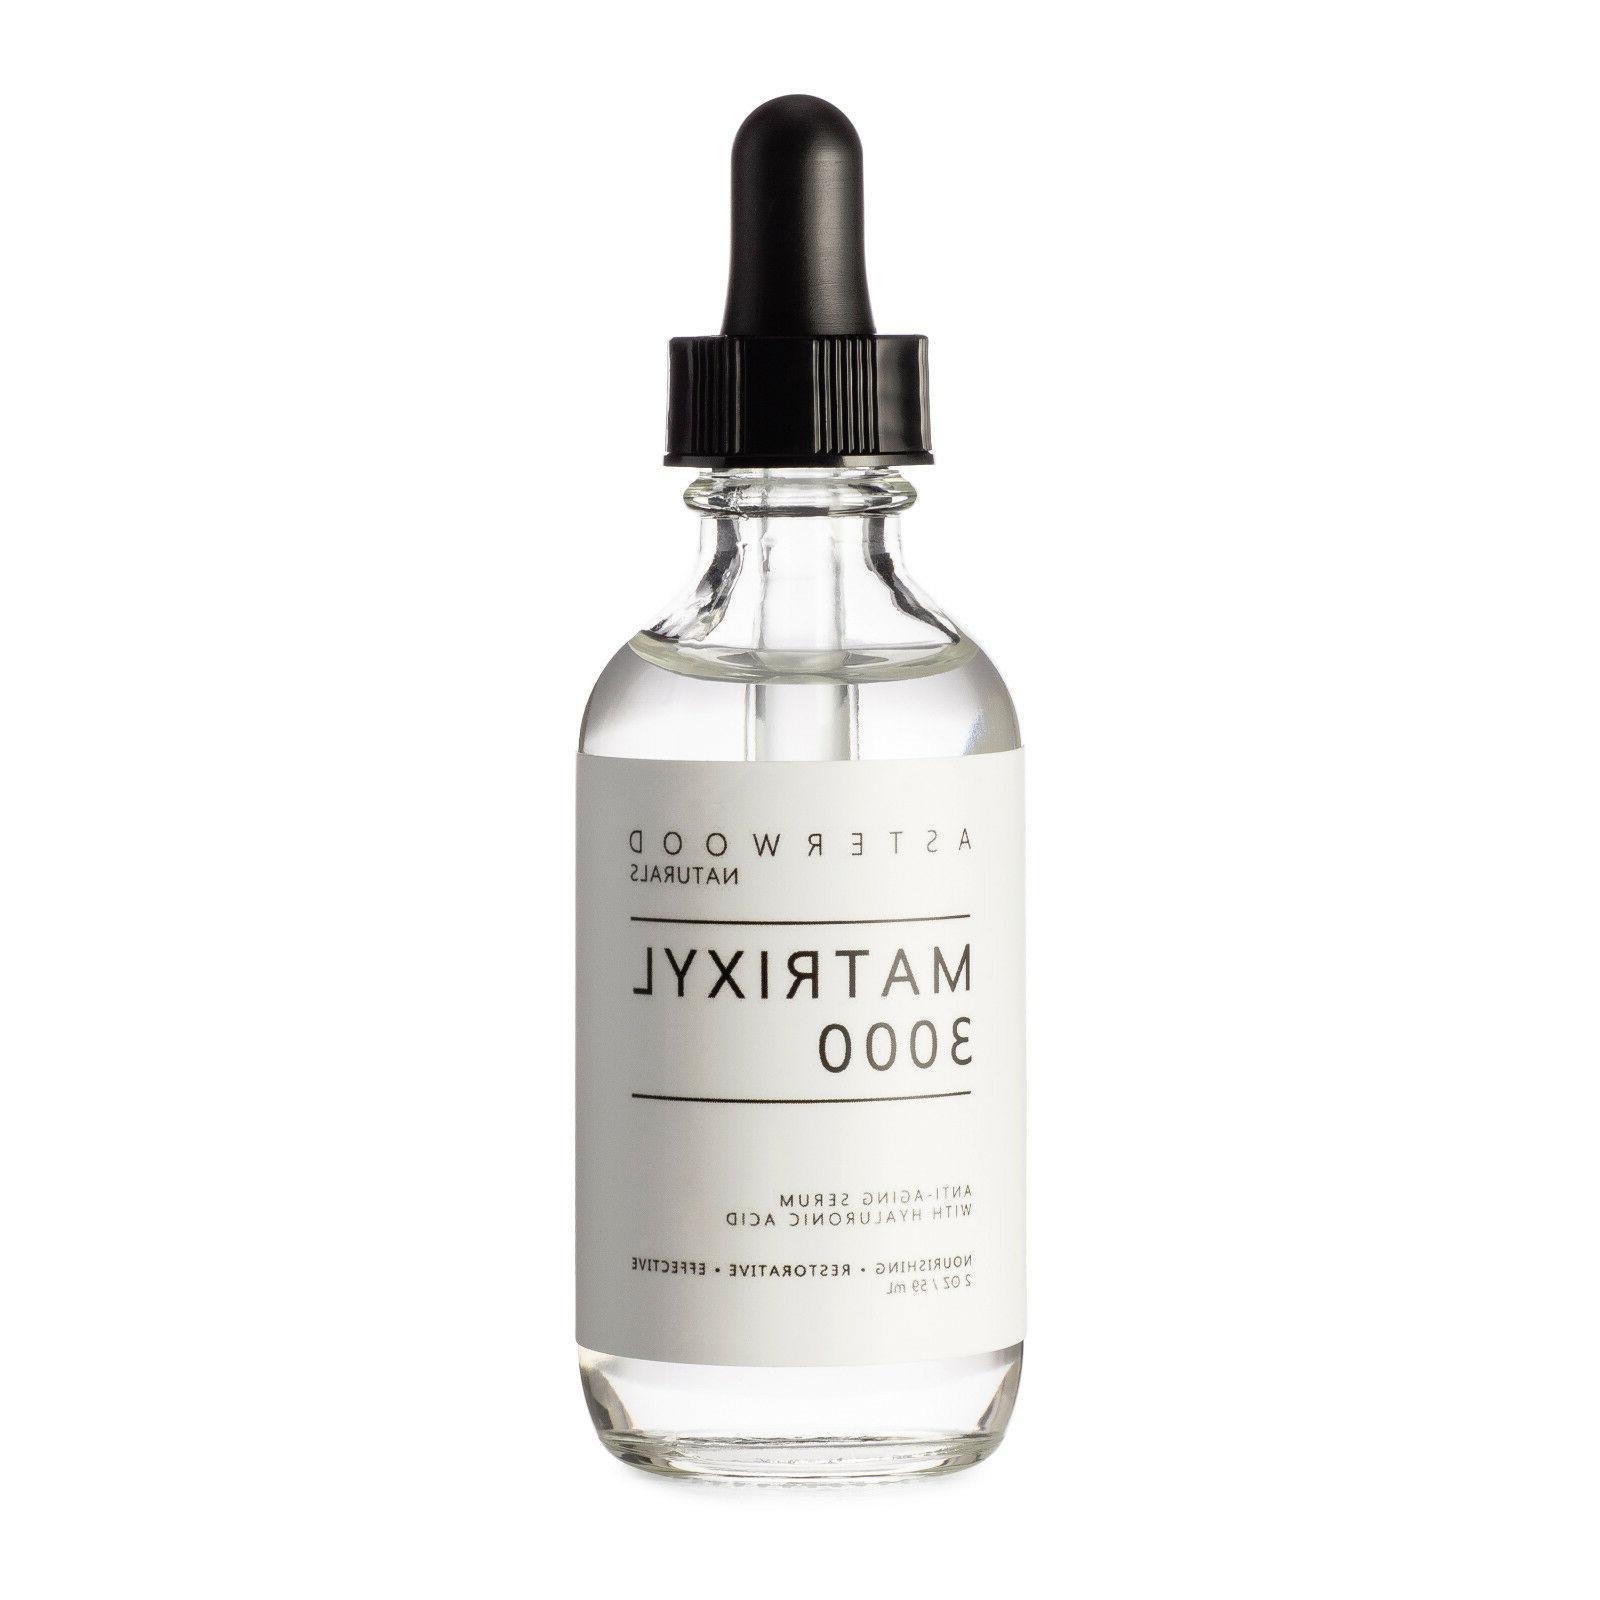 matrixyl 3000 serum w organic hyaluronic acid